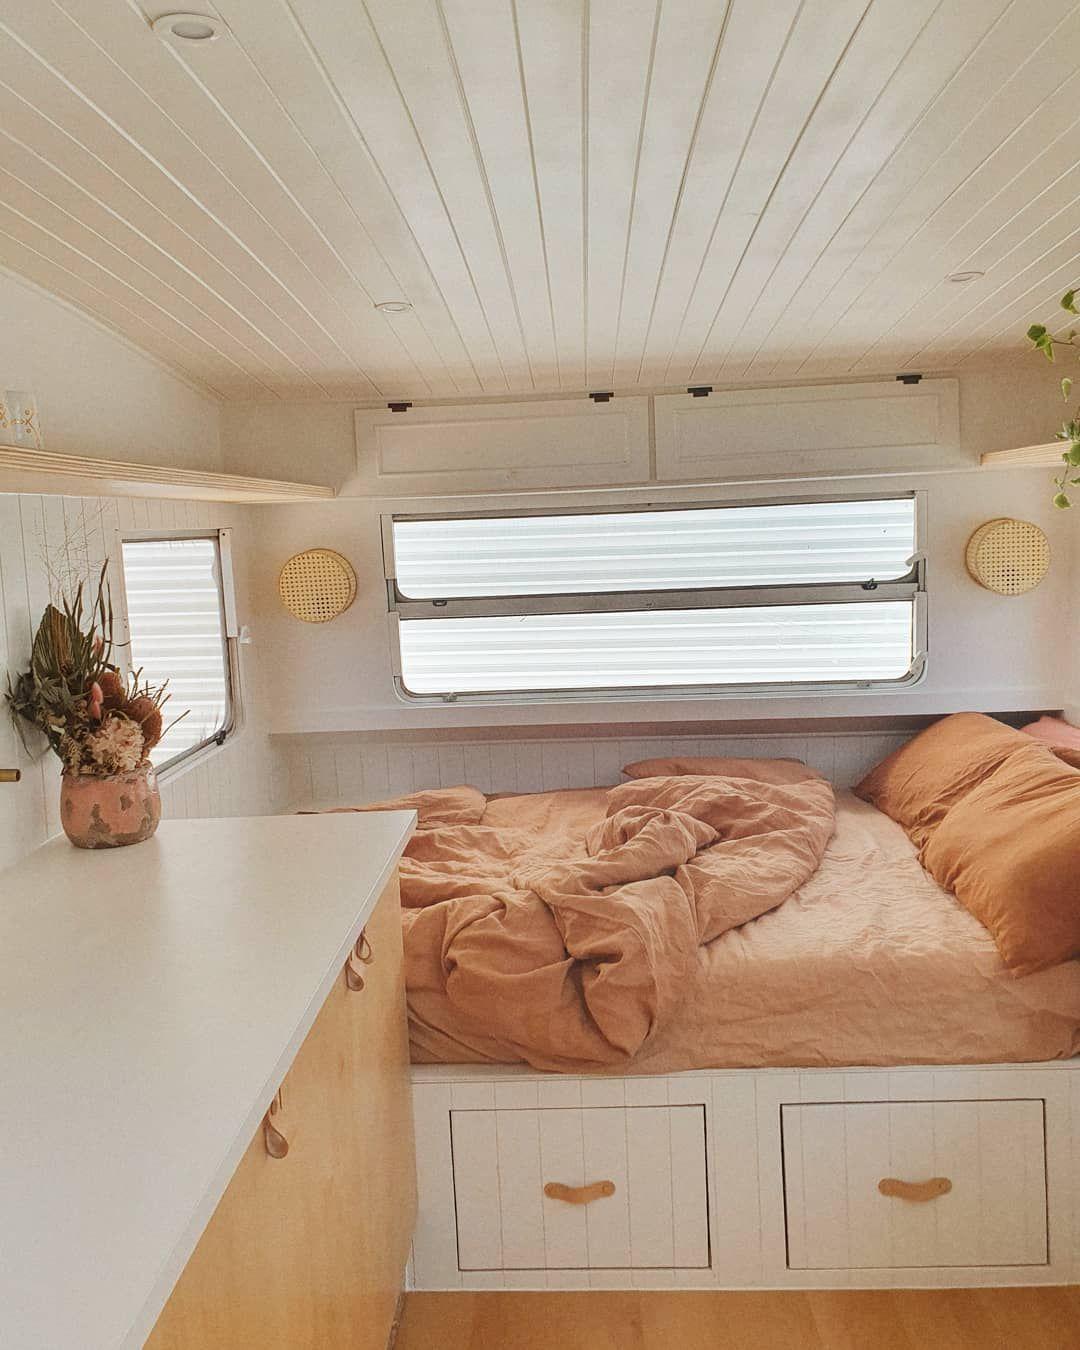 Photo of Viscount Caravan Renovations | Caravan Renovation Series